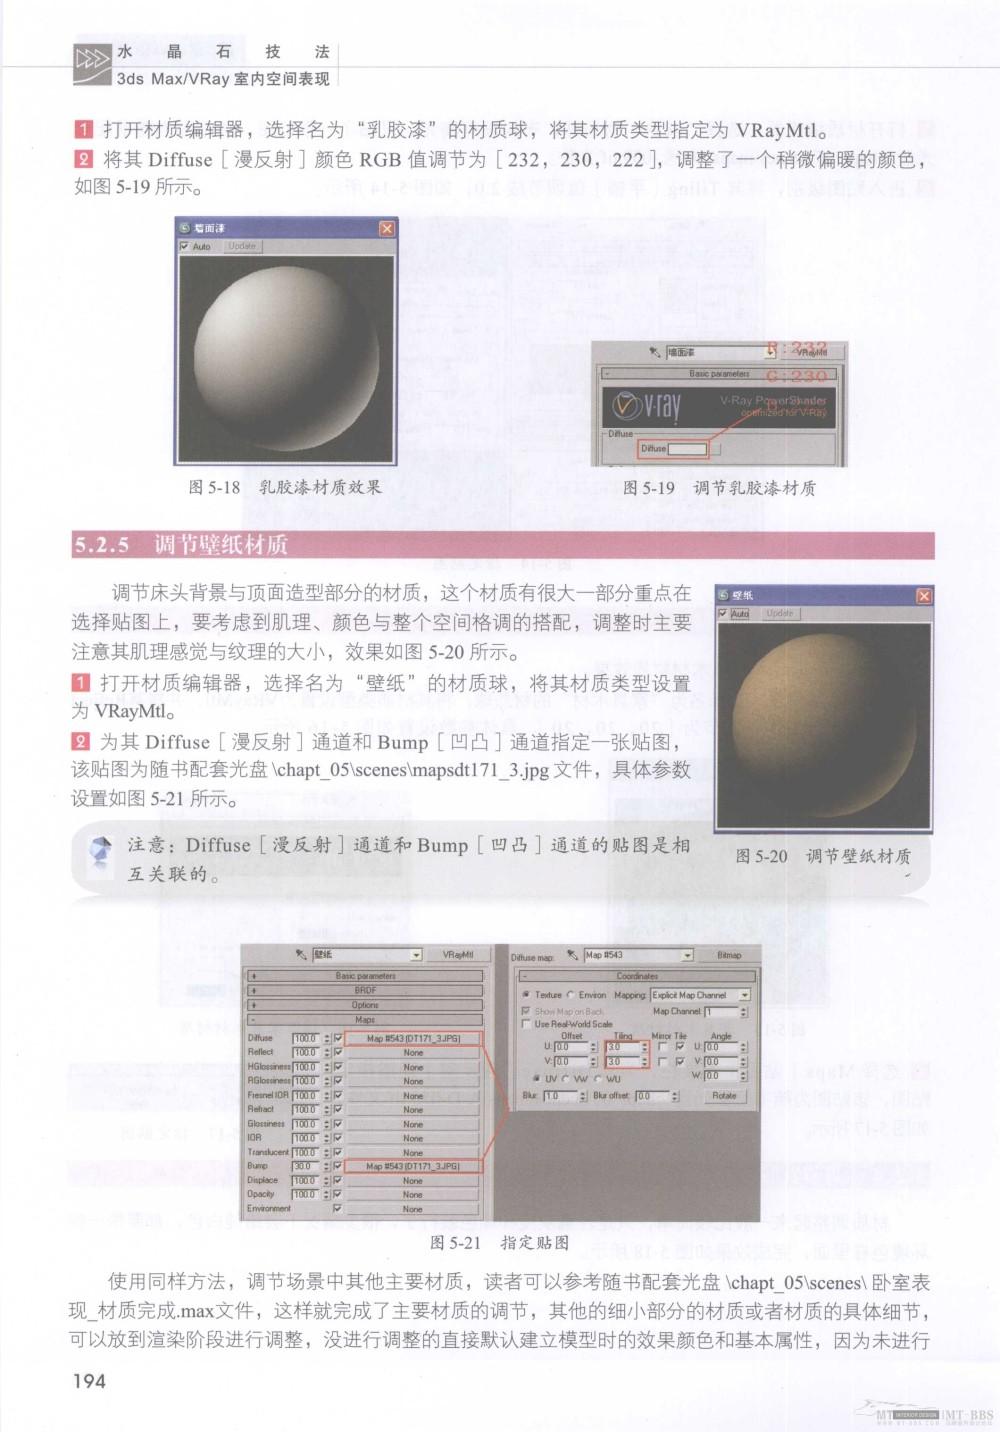 水晶石技法-3ds_Max&VRay室内空间表现_水晶石技法-3ds_Max&VRay室内空间表现_页面_200.jpg